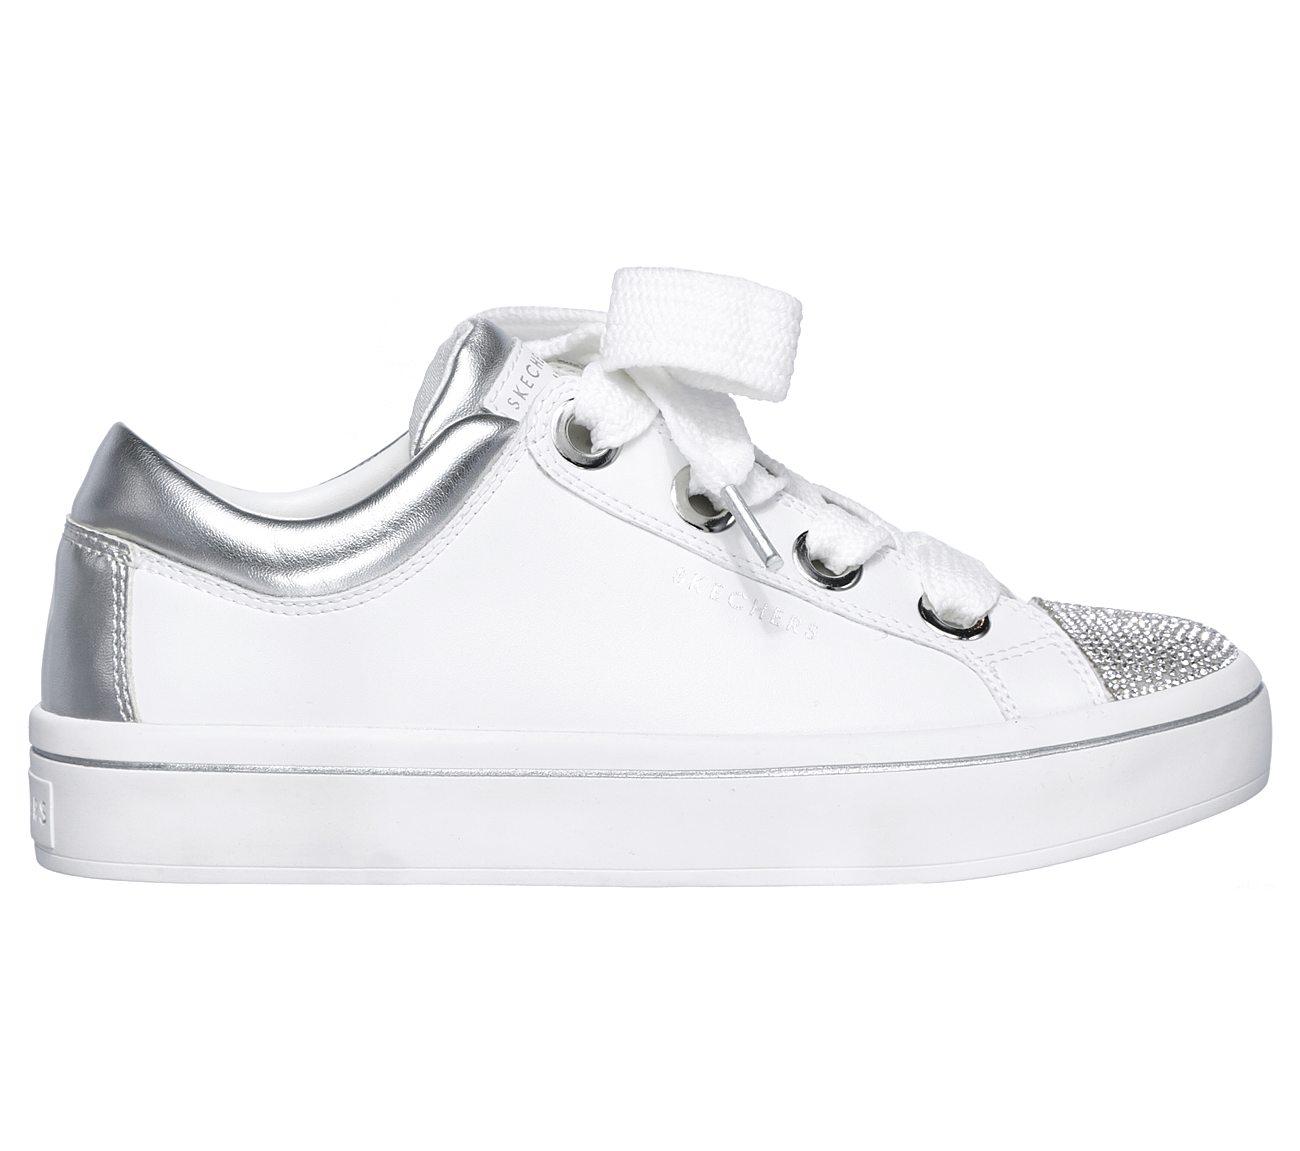 0dae029f4 Buy SKECHERS Hi-Lites - Space Dancer SKECHER Street Shoes only $70.00